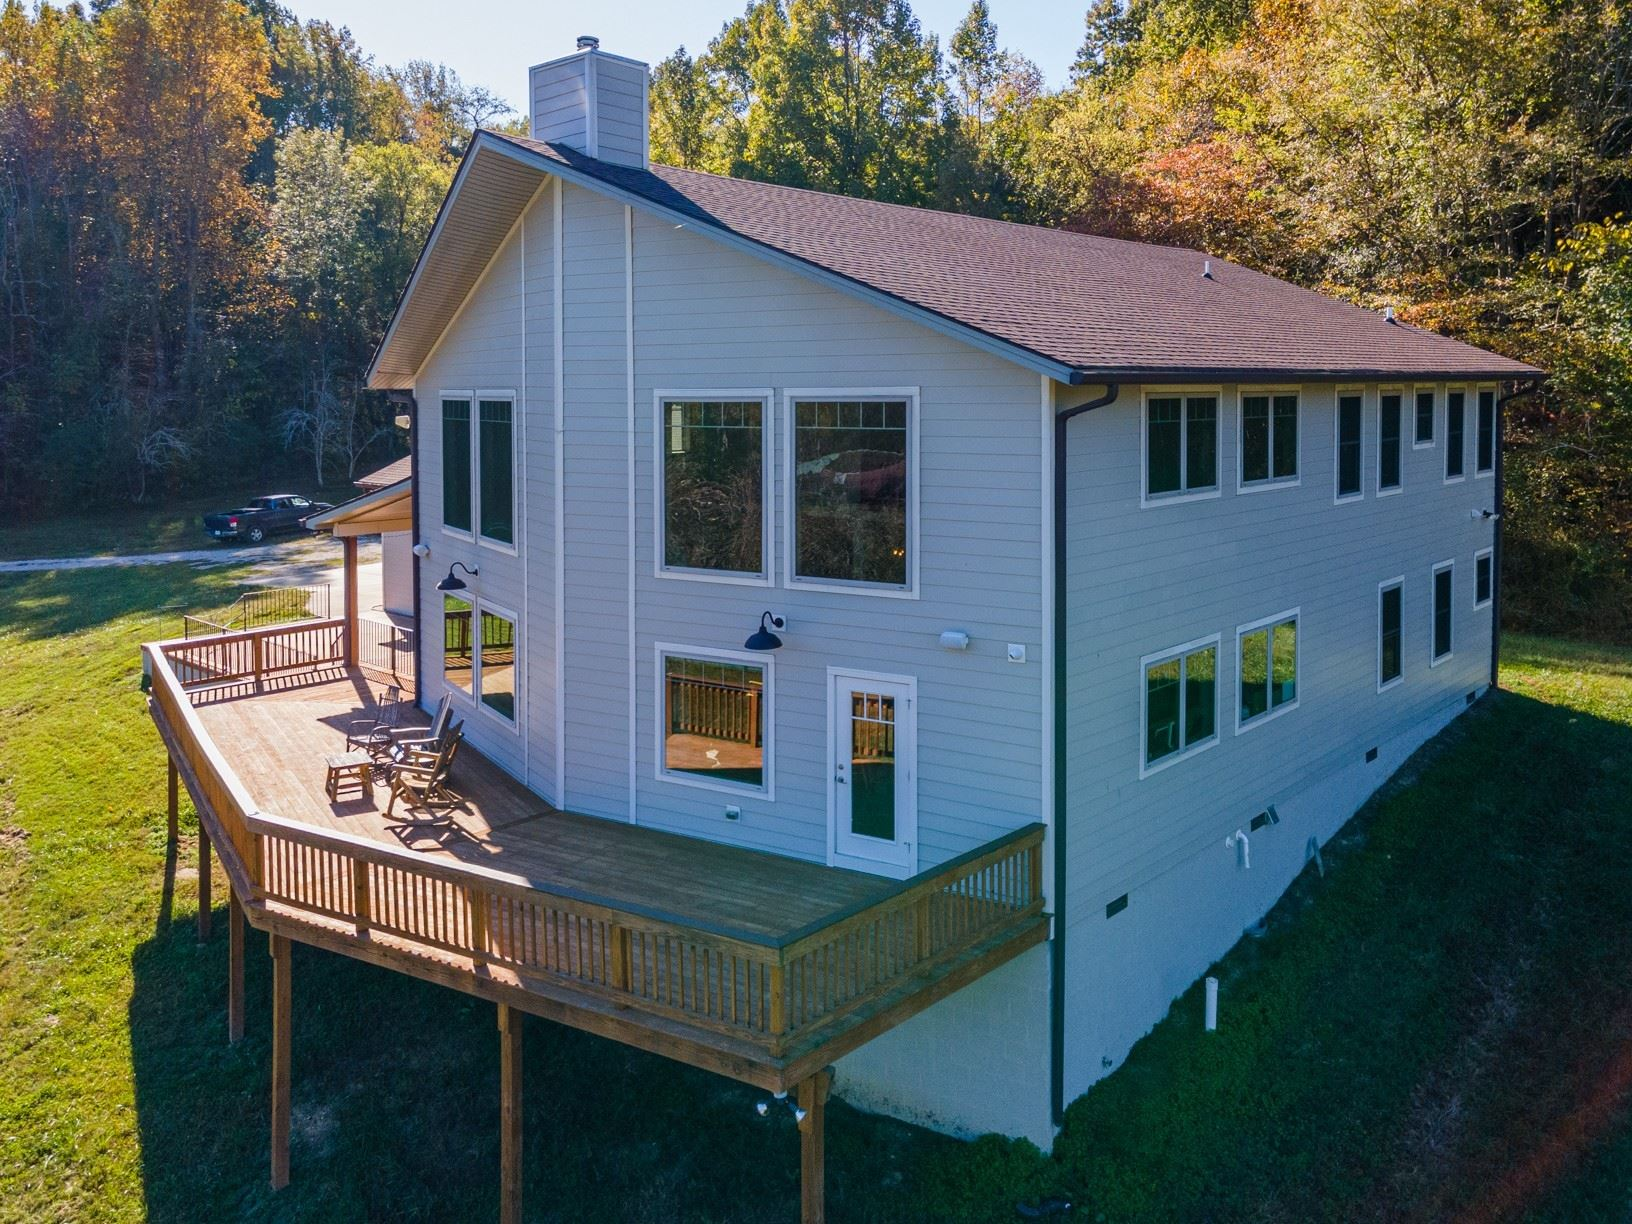 2794 Brown Hollow Rd, Columbia, TN 38401 - MLS#: 2200284